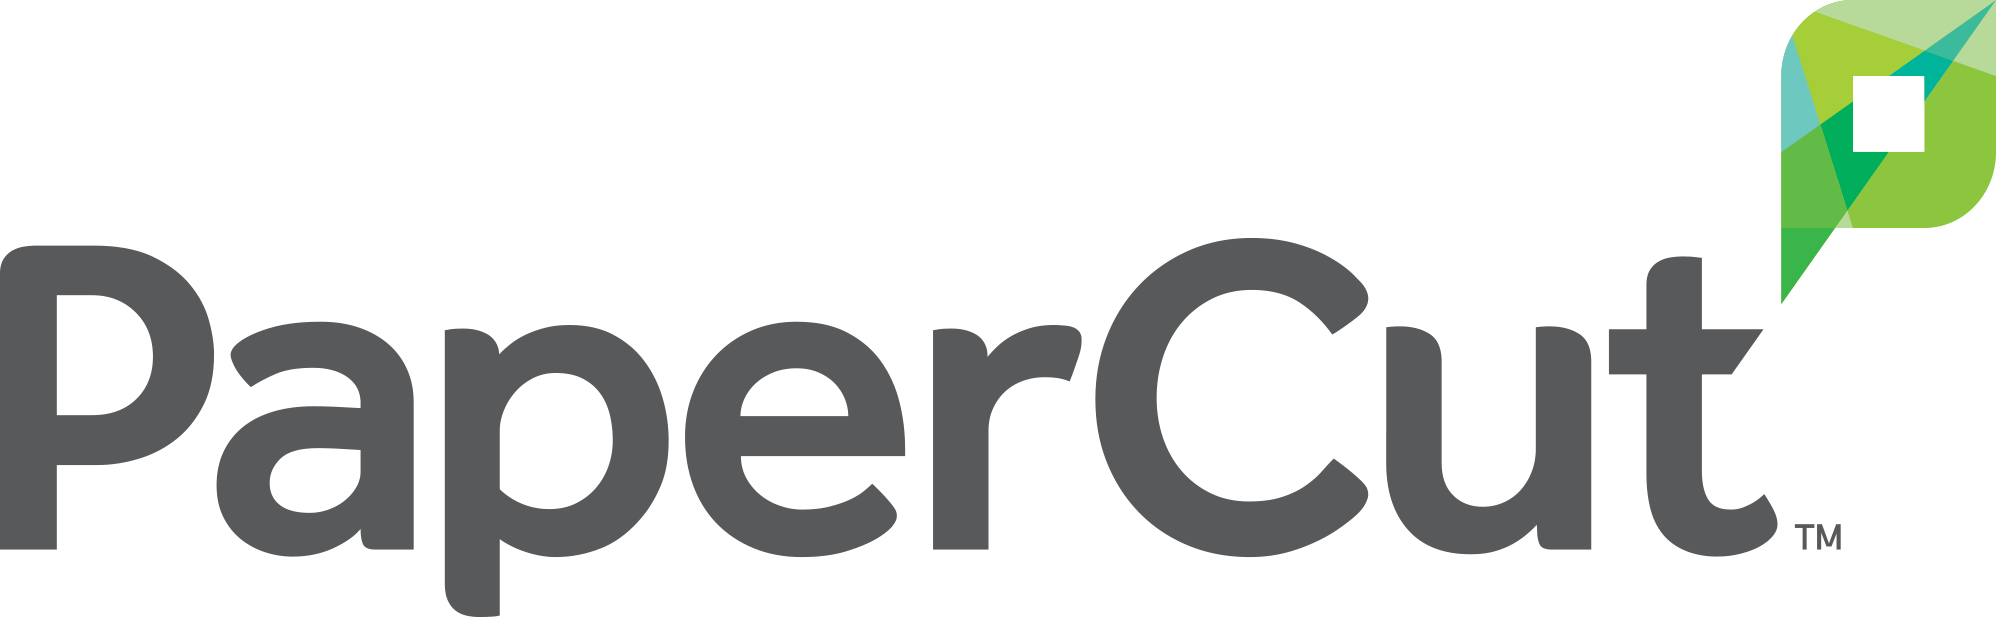 PaperCut-Logotype